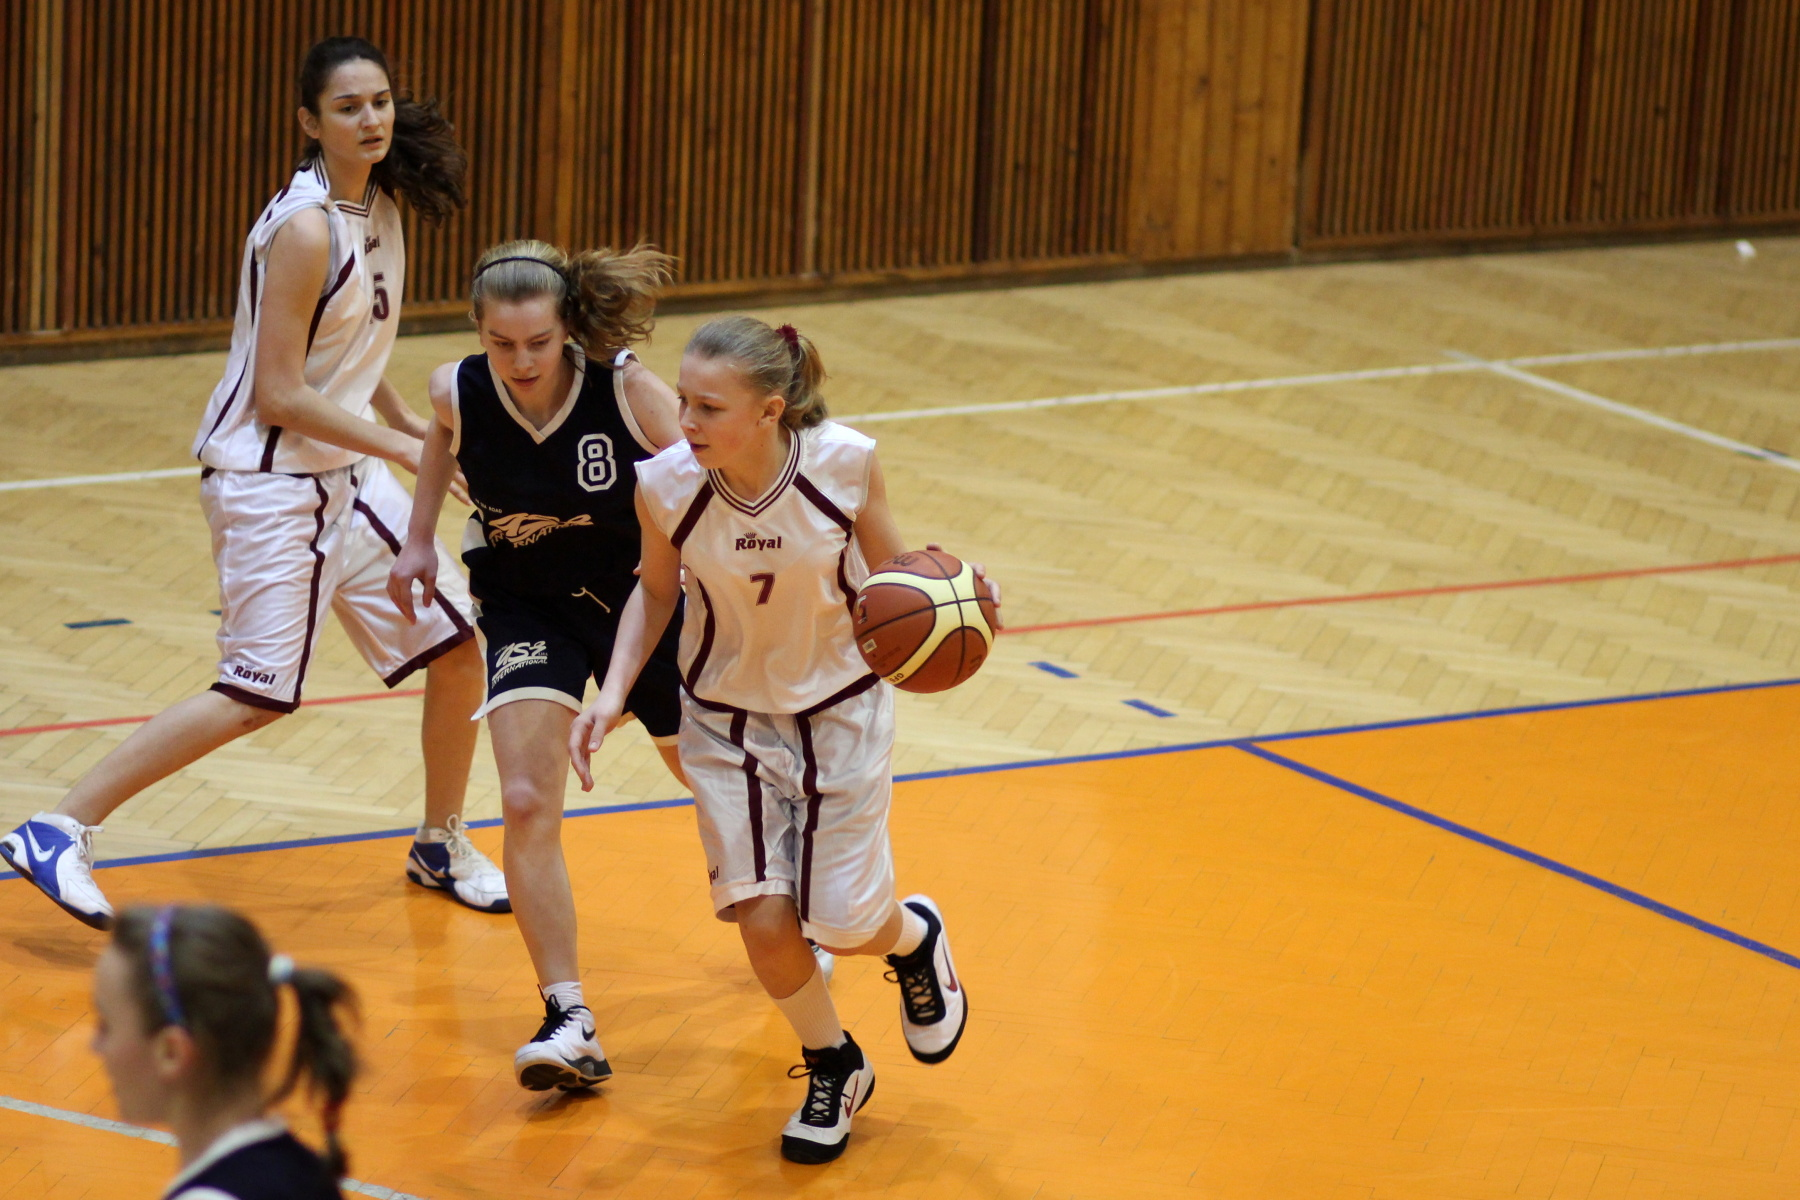 bk-zvolen-bk-petrzalka-ziacky-basketbal-16